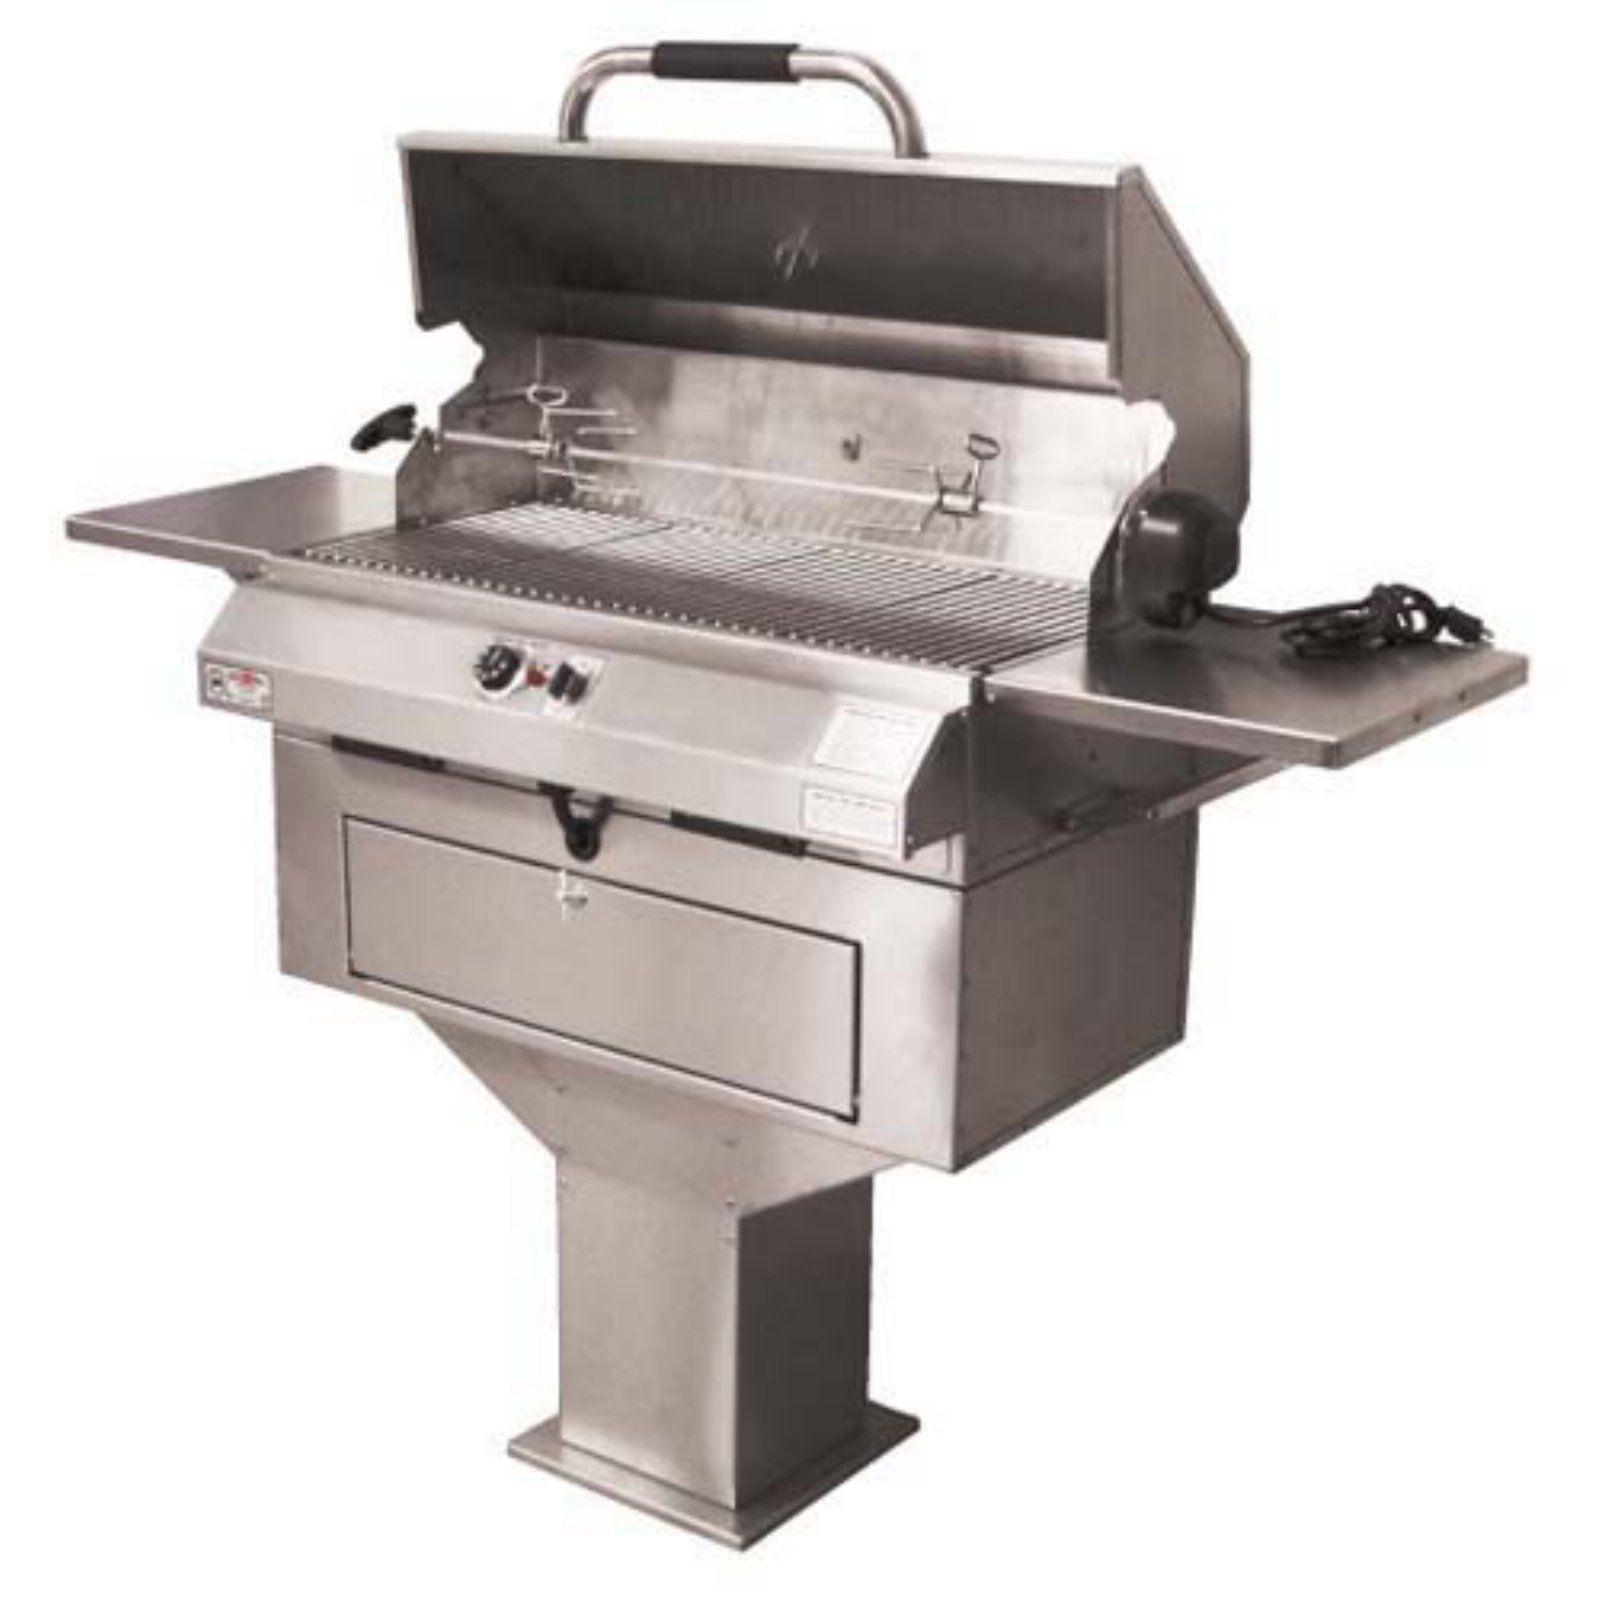 Electri Chef Electric Grill Single Burner | Grilling